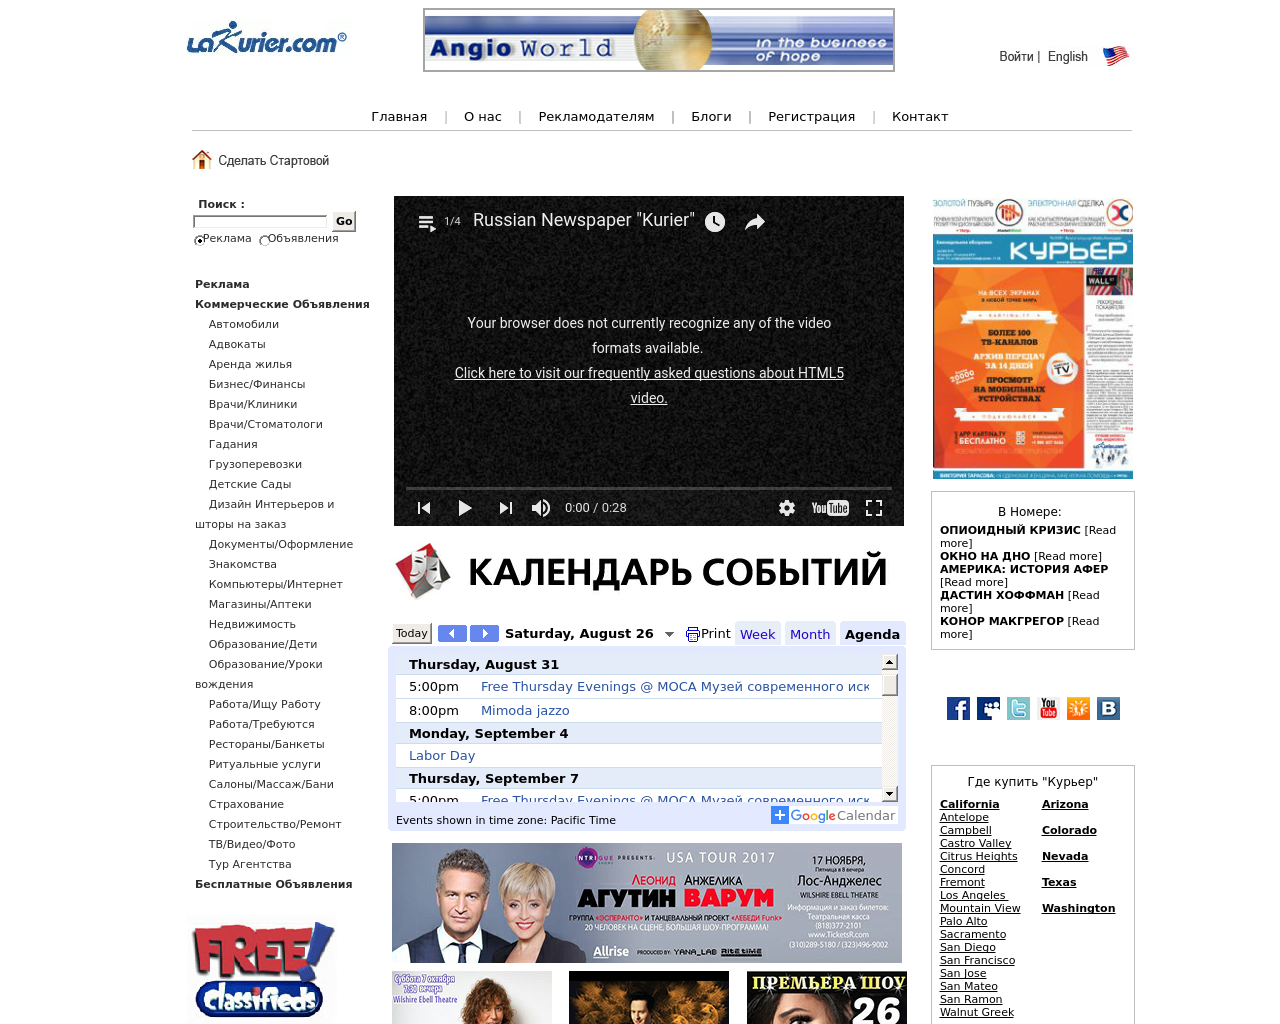 LAKurier.com-Advertising-Reviews-Pricing